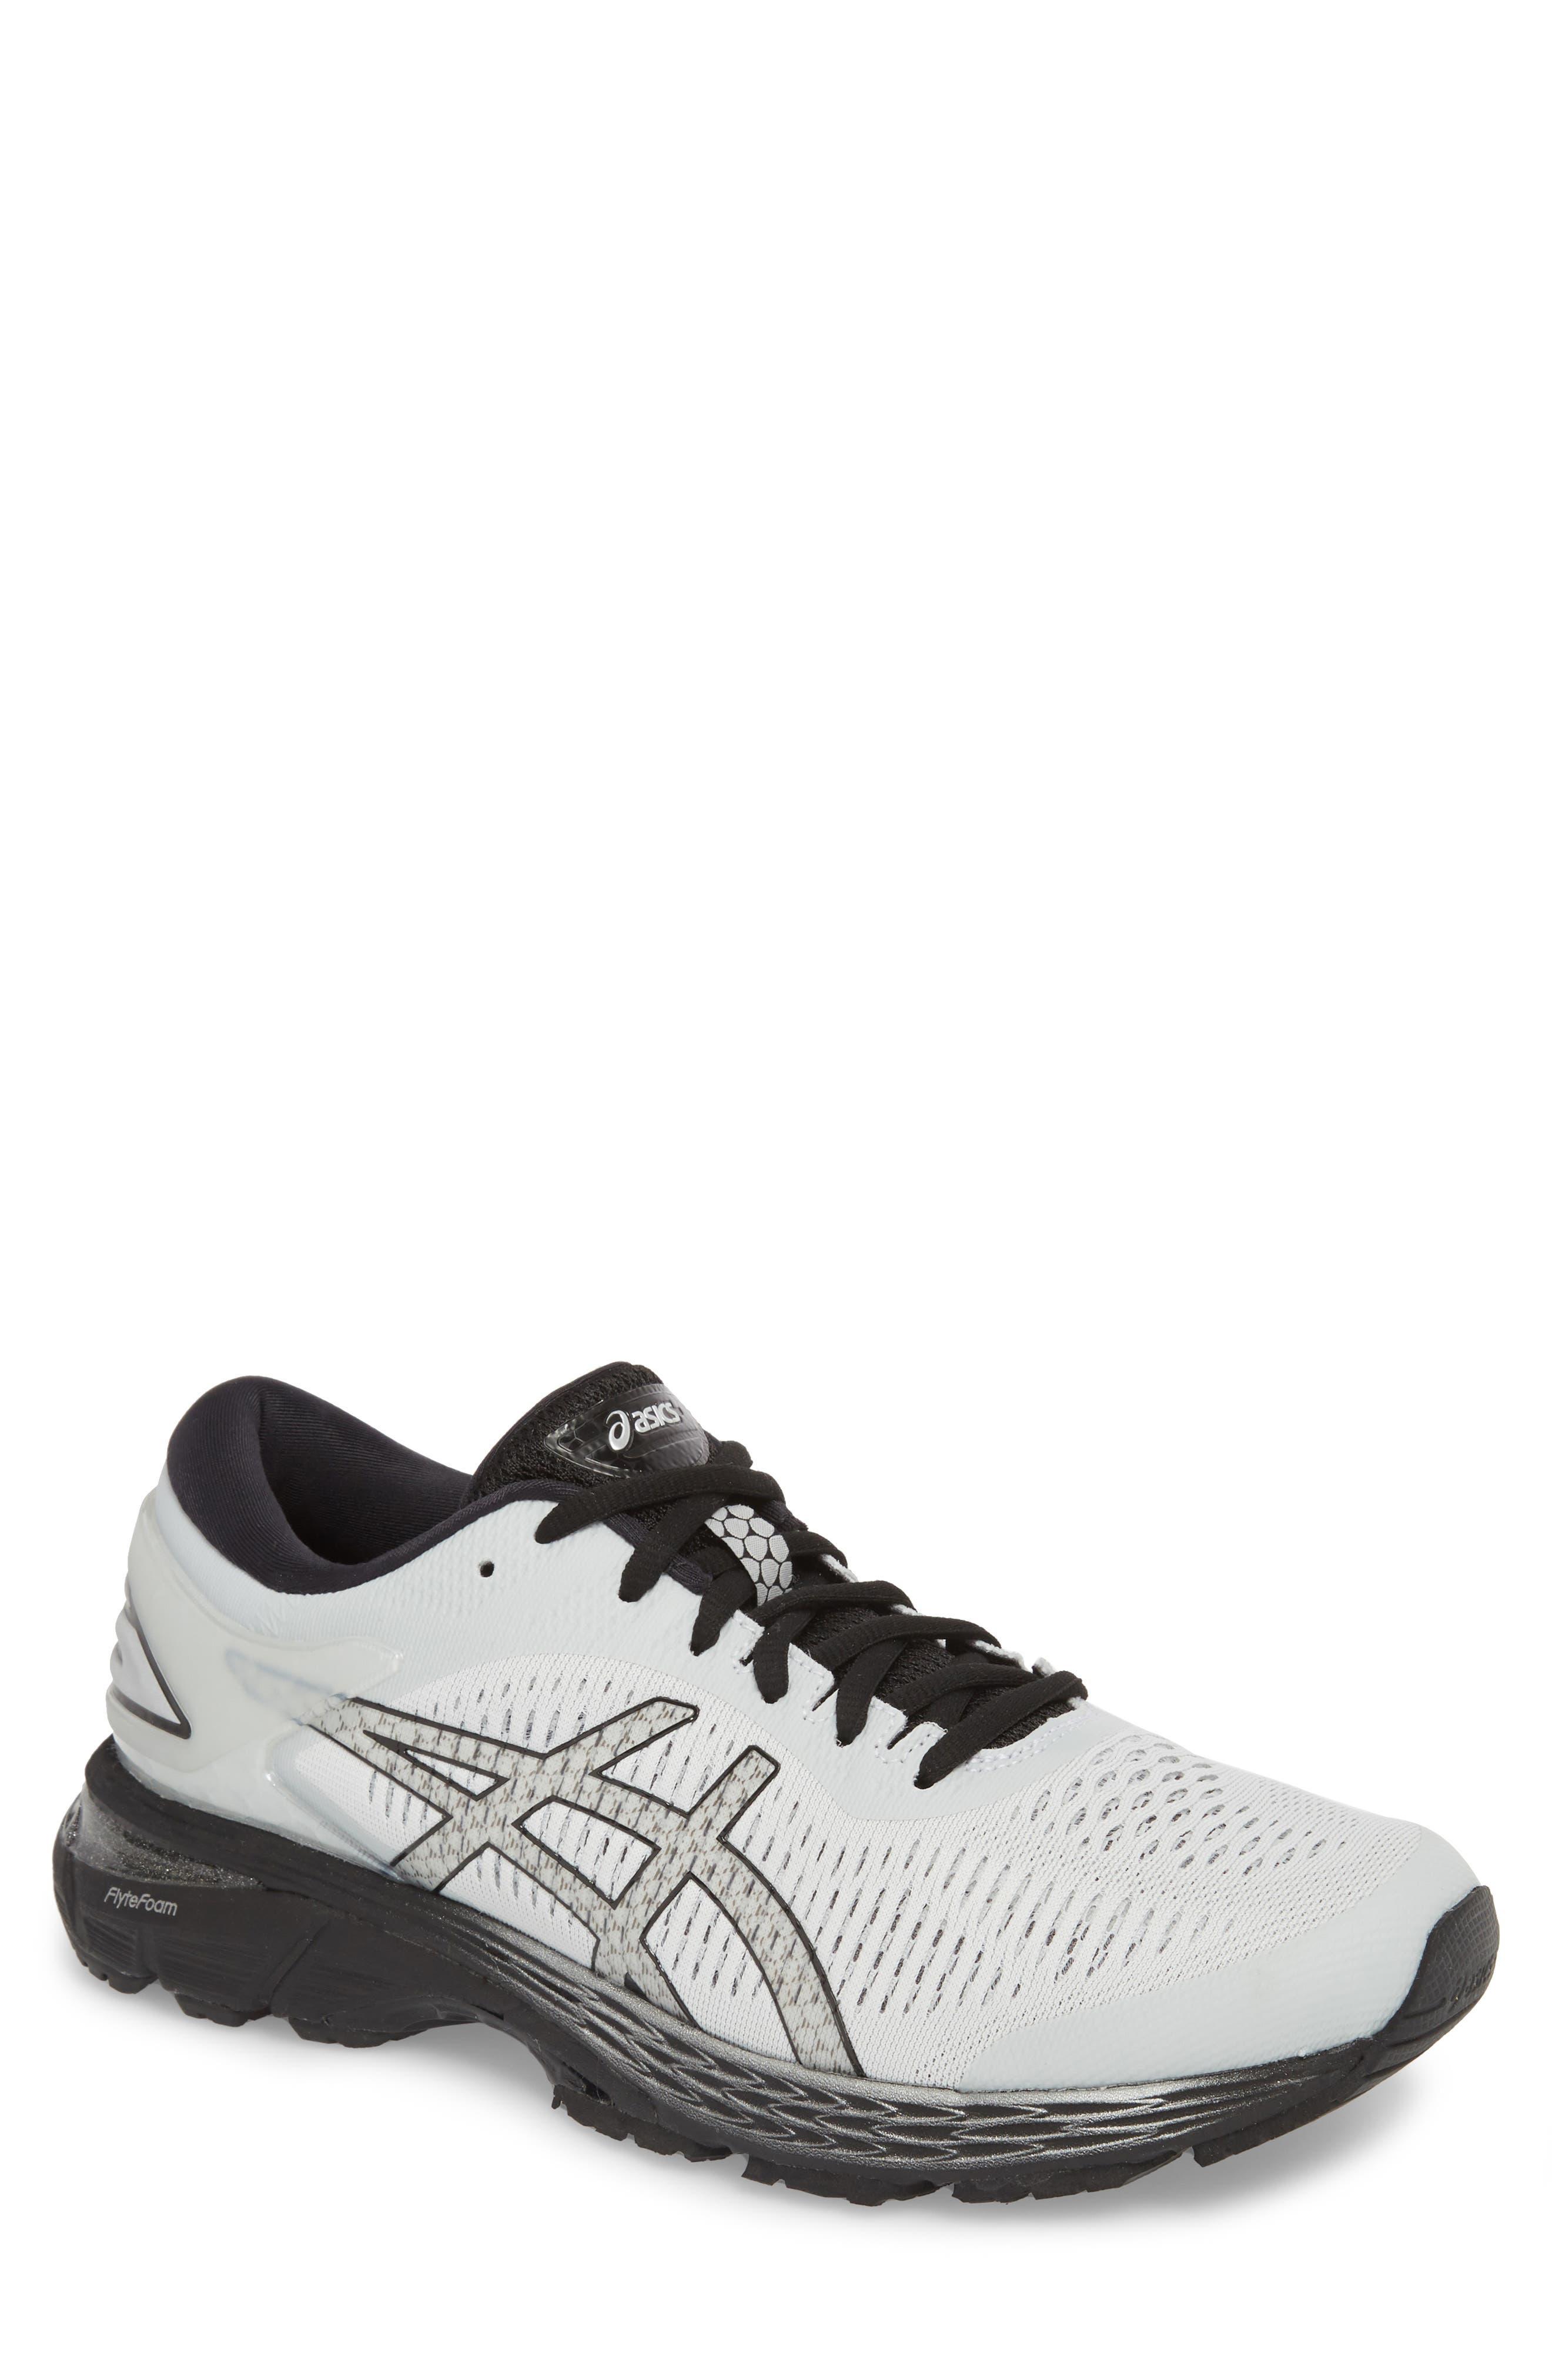 GEL-Kayano<sup>®</sup> 25 Running Shoe, Main, color, GLACIER GREY/ BLACK